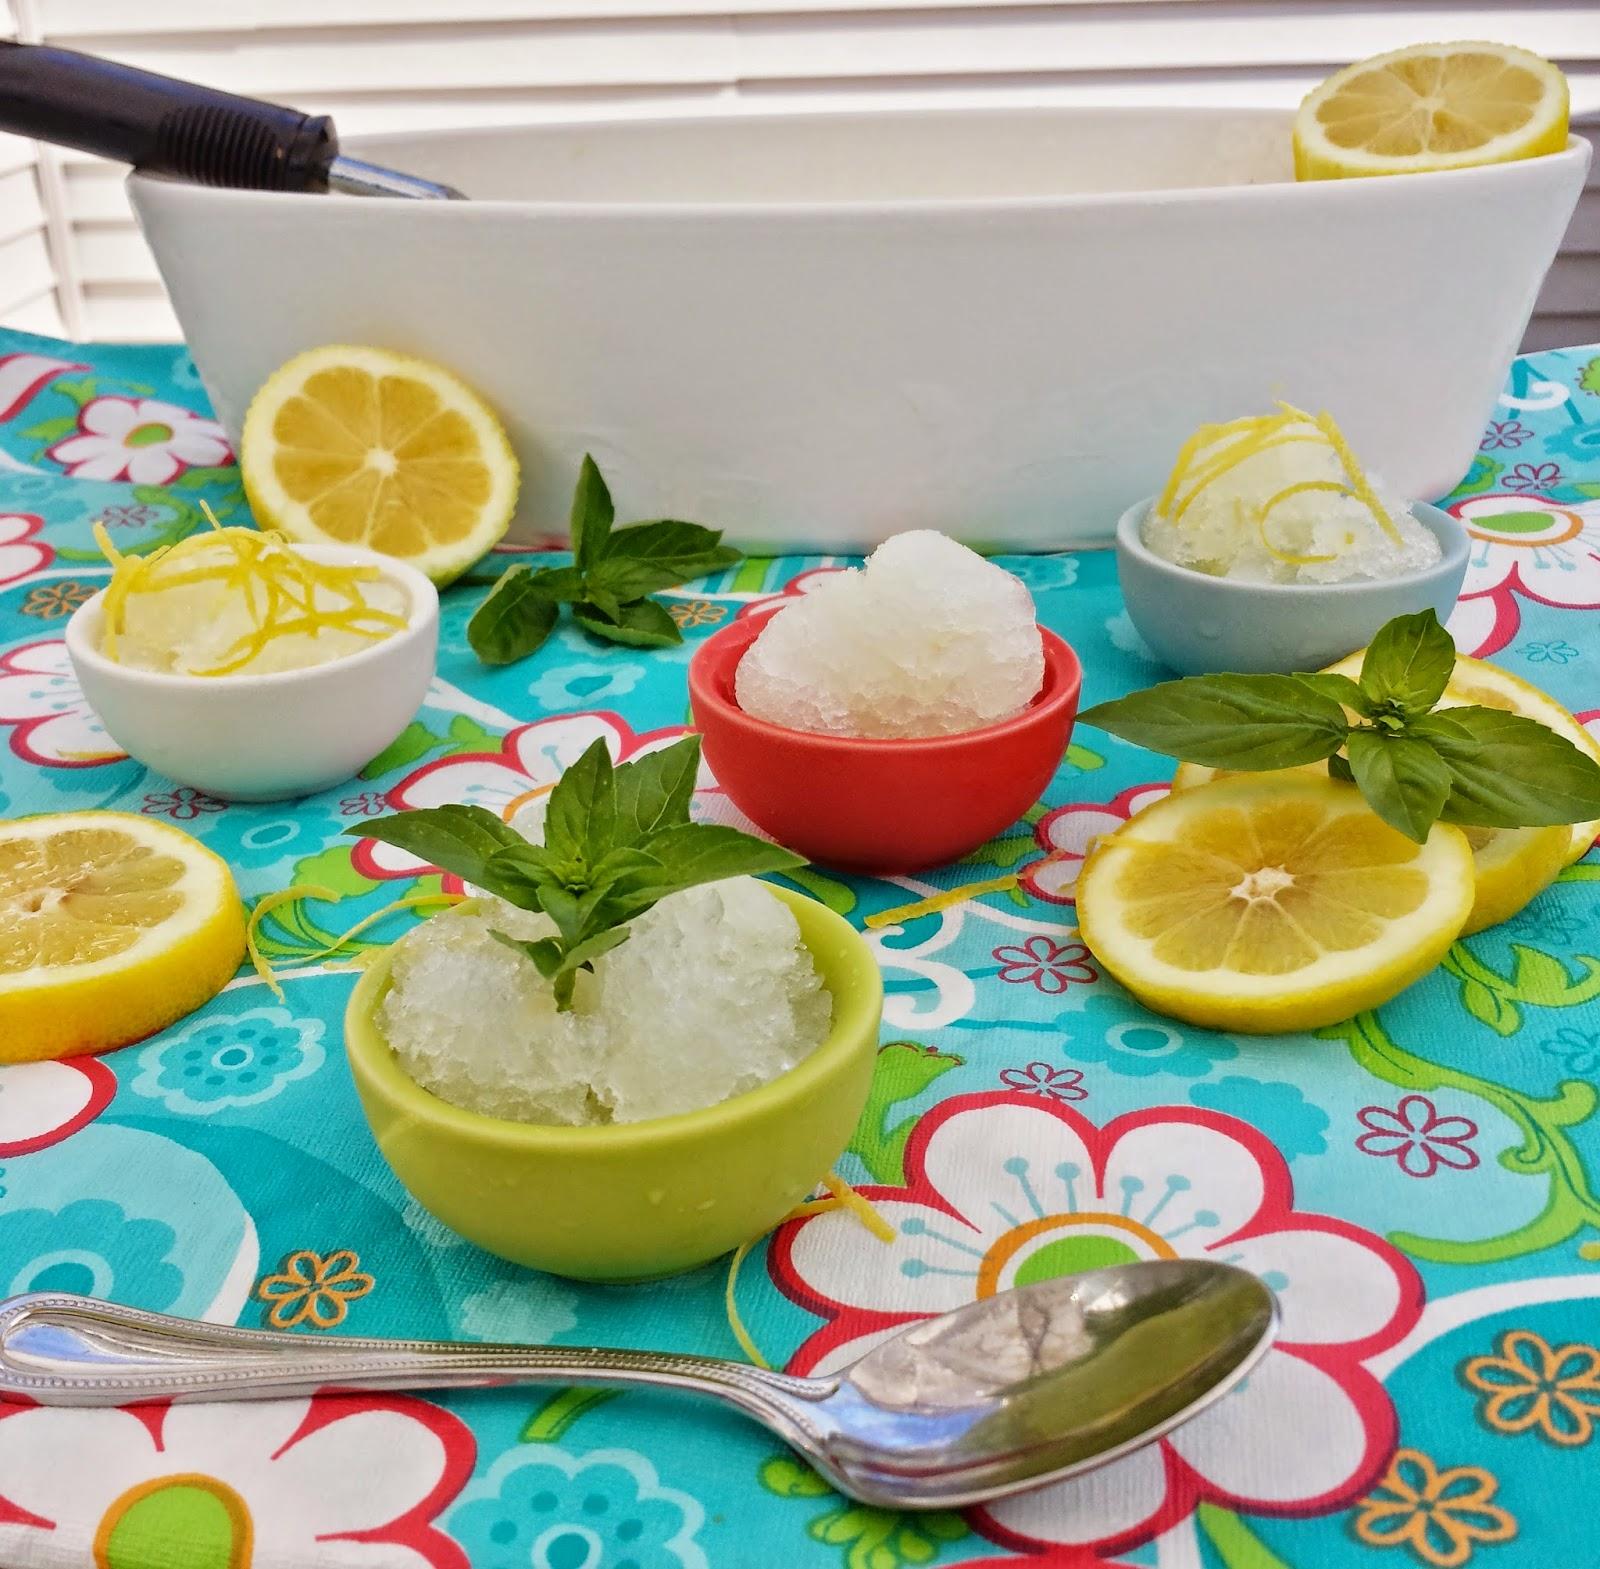 Lemon Italian Ice - Three Kids and a Fish